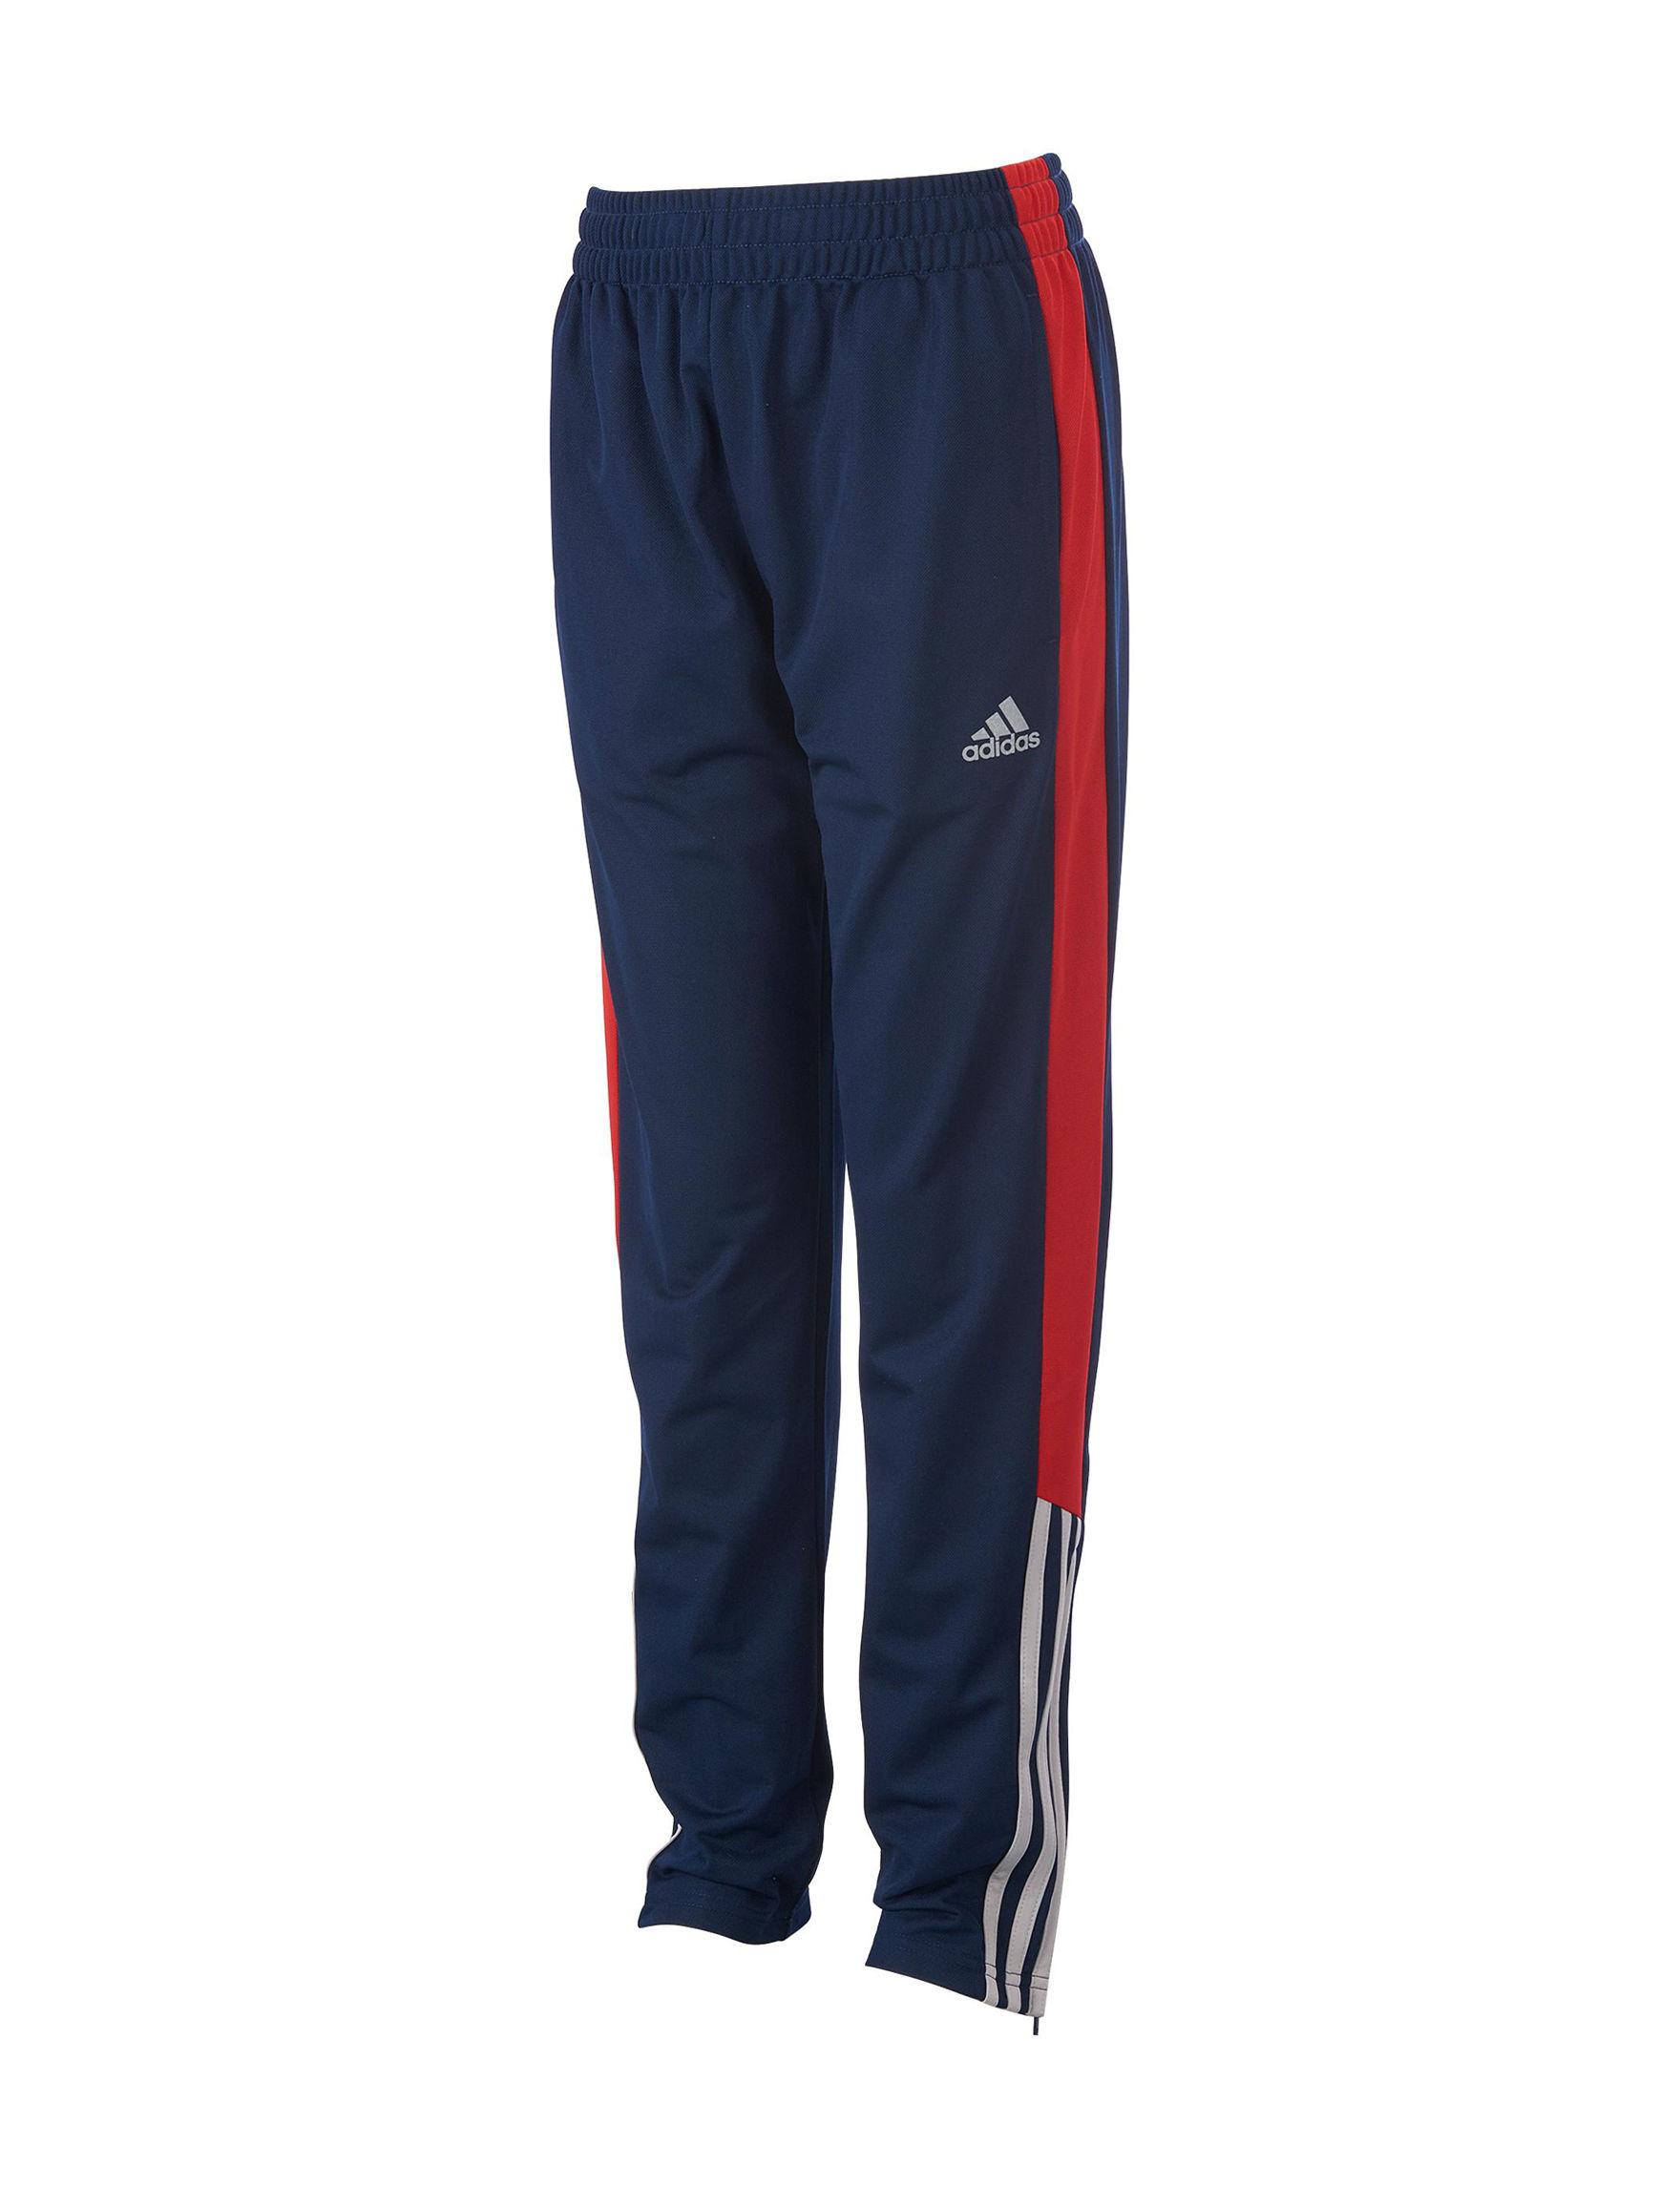 Adidas Blue Soft Pants